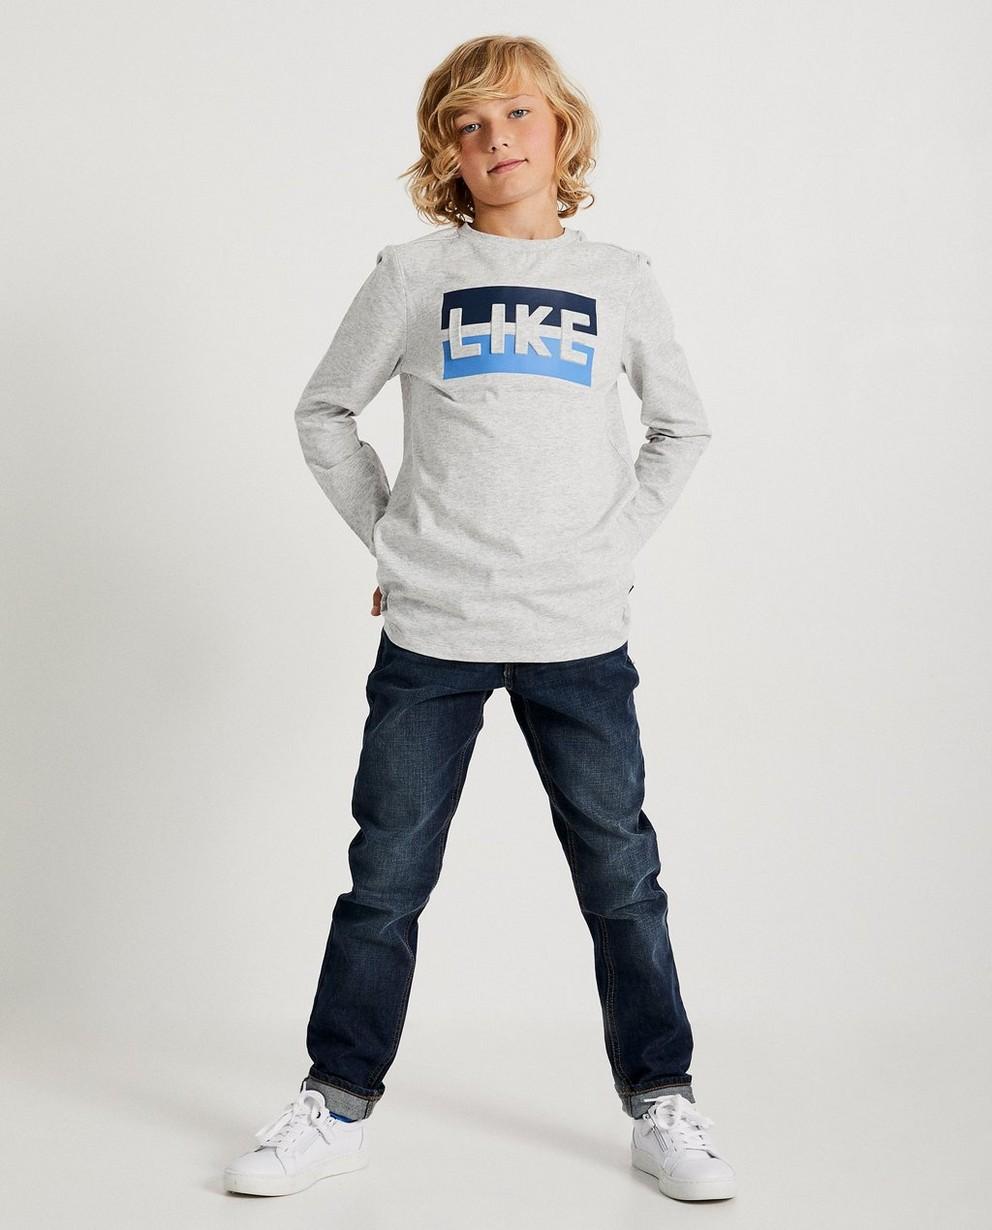 T-shirt bleu «LIKE» Ketnet - Ketnet - Ketnet